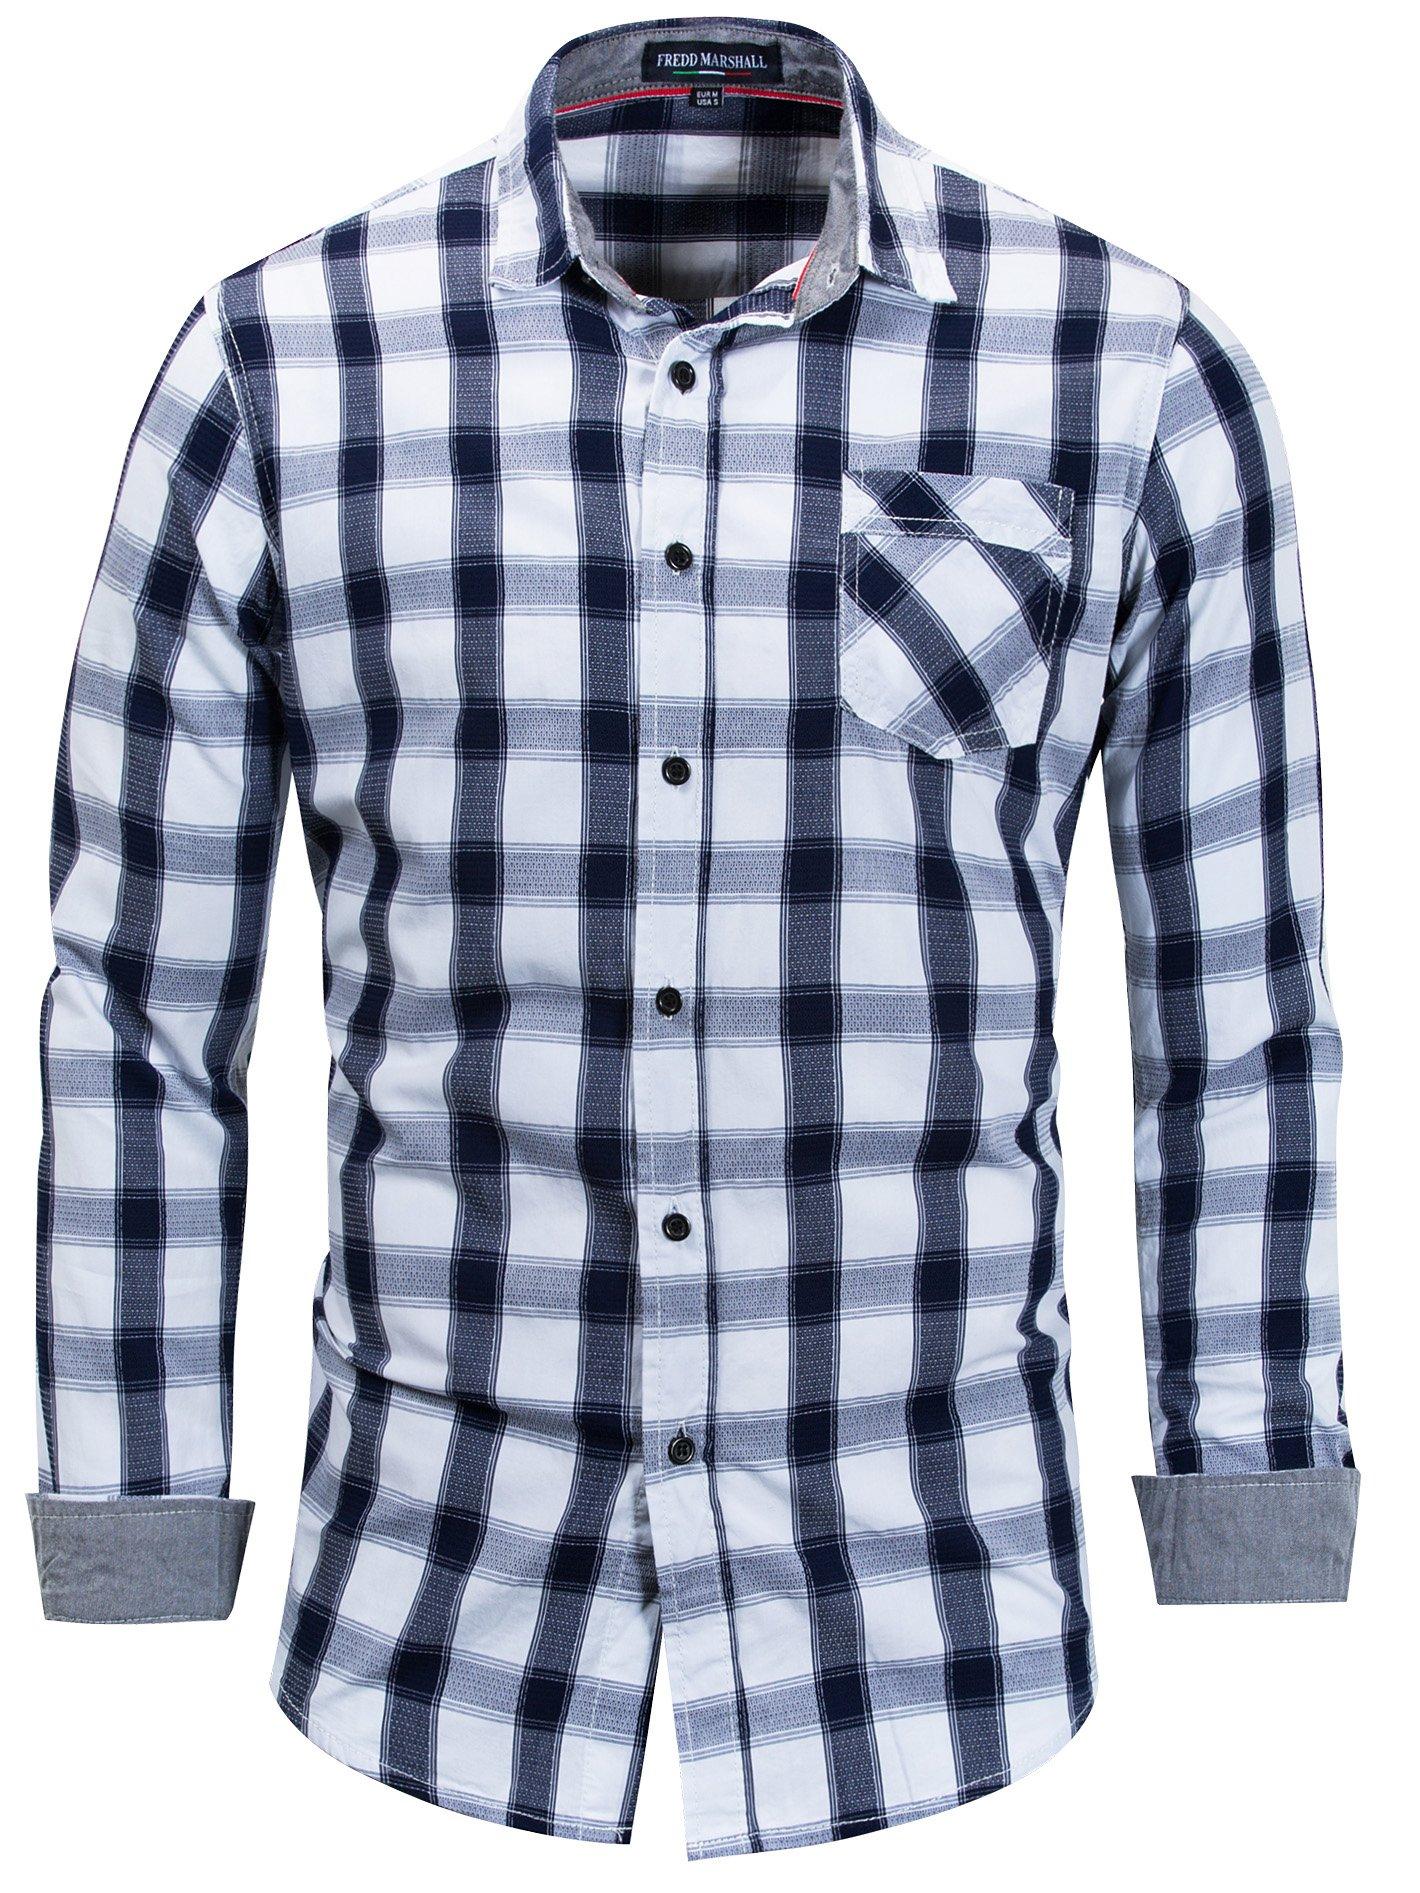 Neleus Men's Cotton Casual Plaid Long Sleeve Dress Shirt,158,Blue & White,L,EU XL